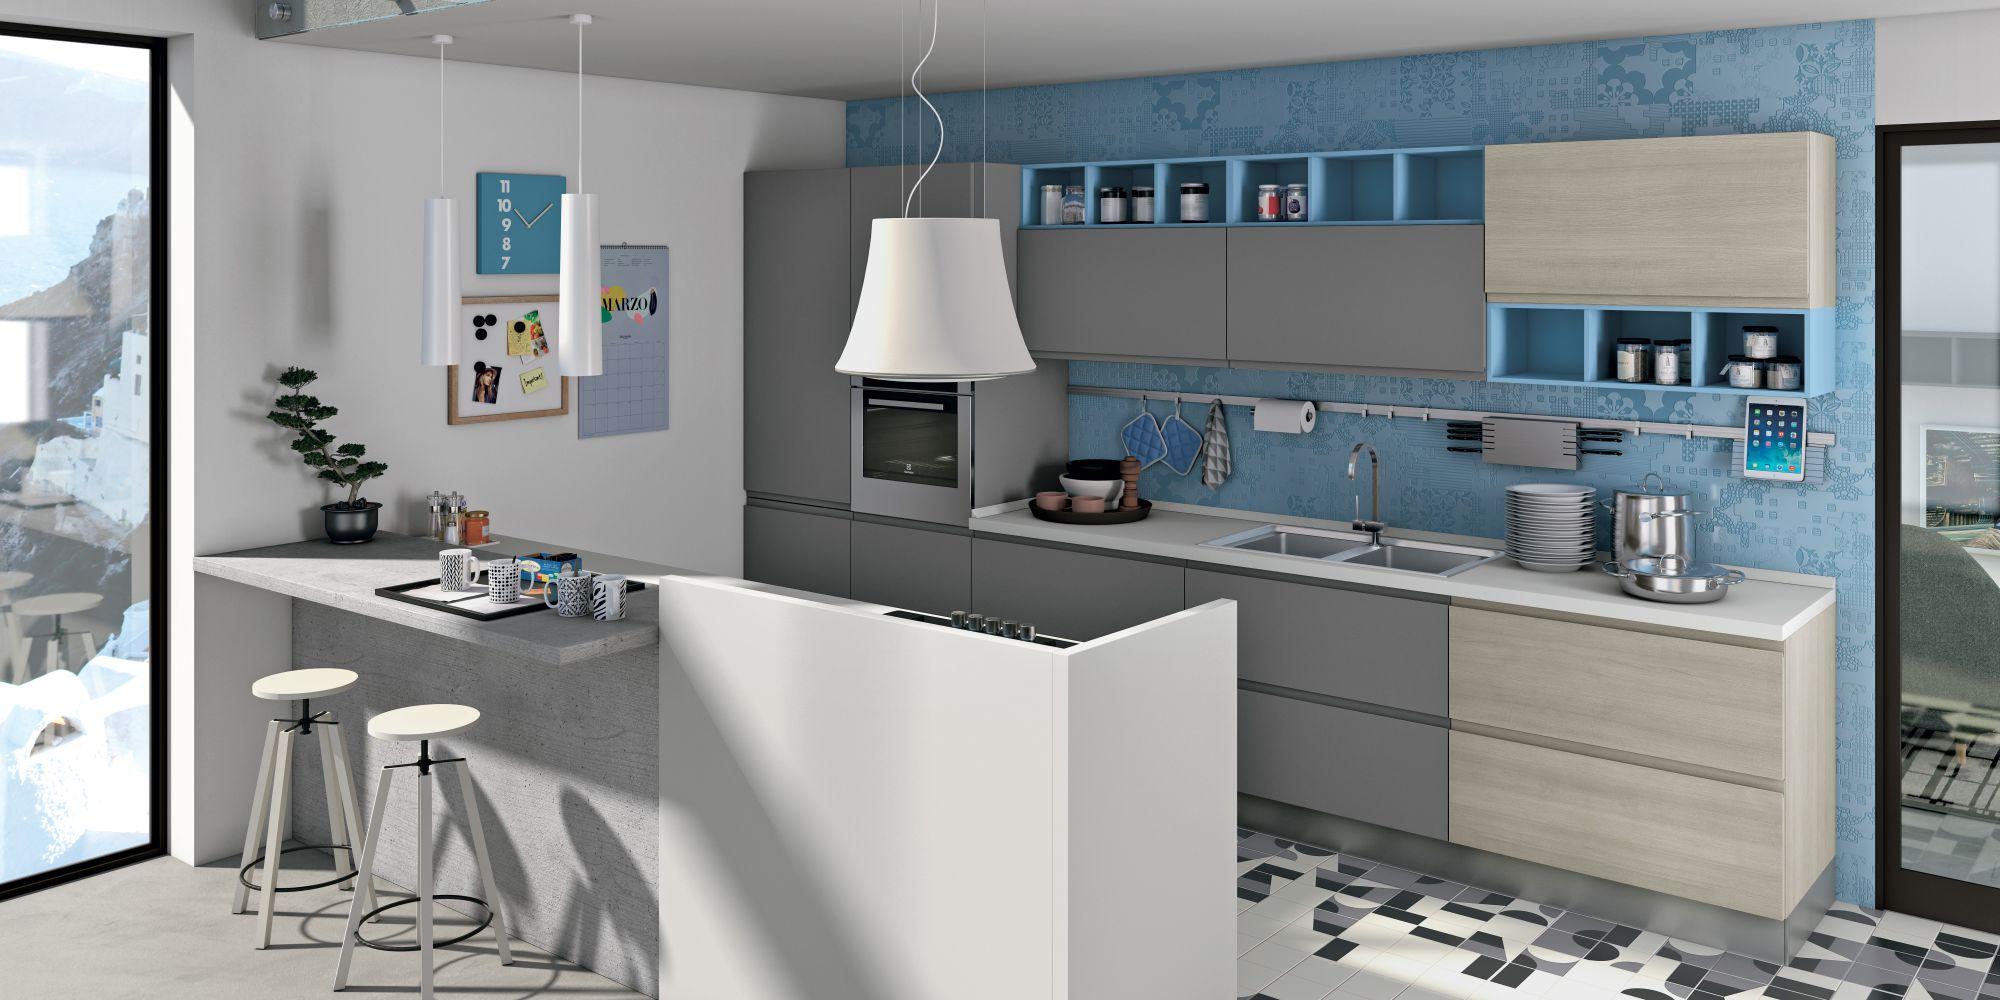 Cucina jey di creo kitchens stile e design essenziale - Maniglie ante cucina ...